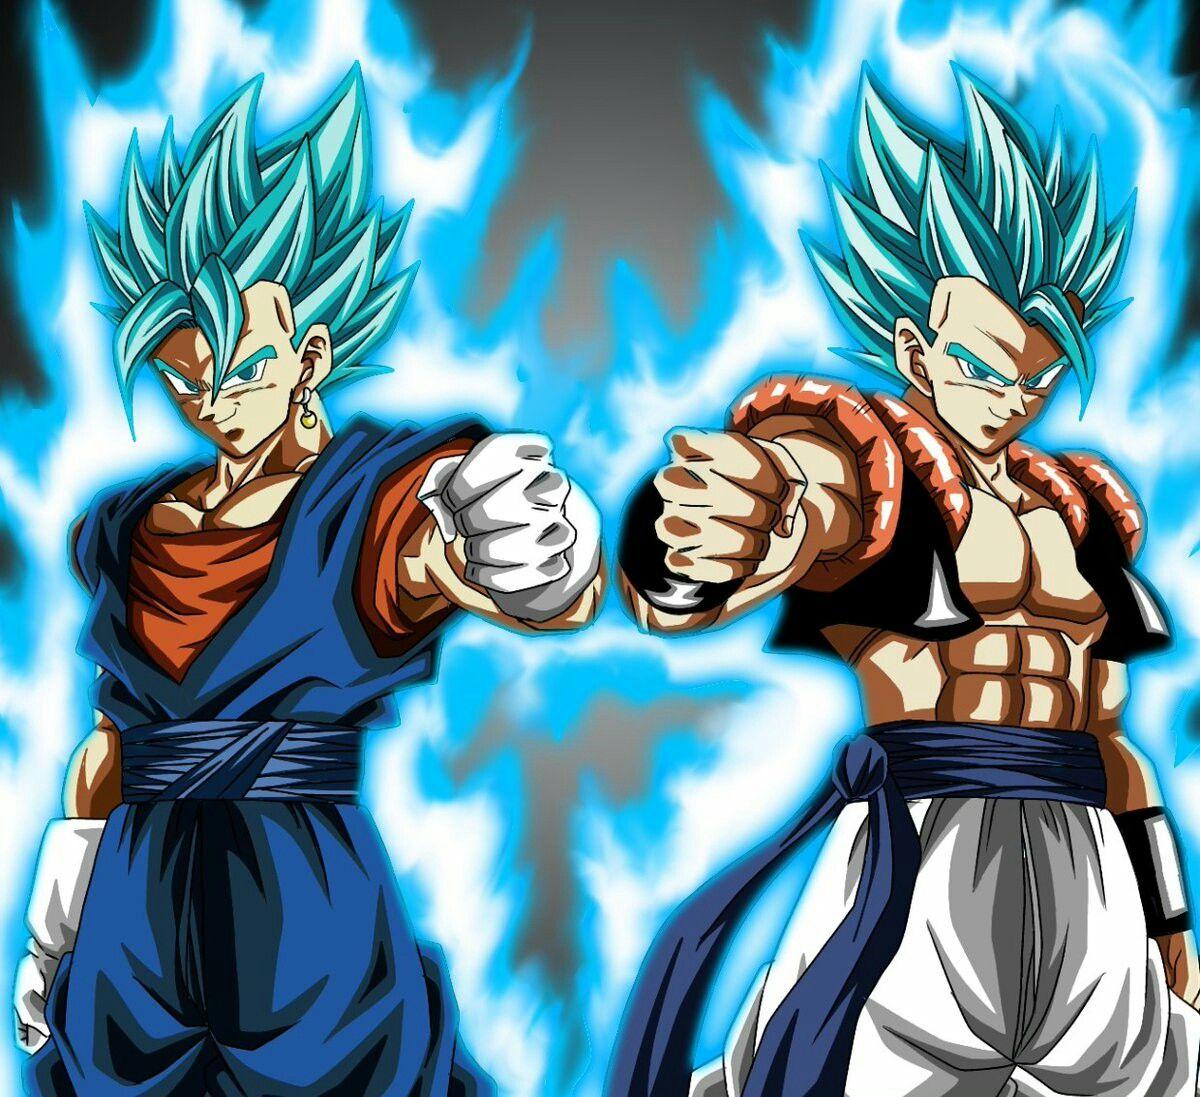 Vegetto & Gogeta SSJ Blue | Vegetto y gogeta, Personajes de goku,  Personajes de dragon ball